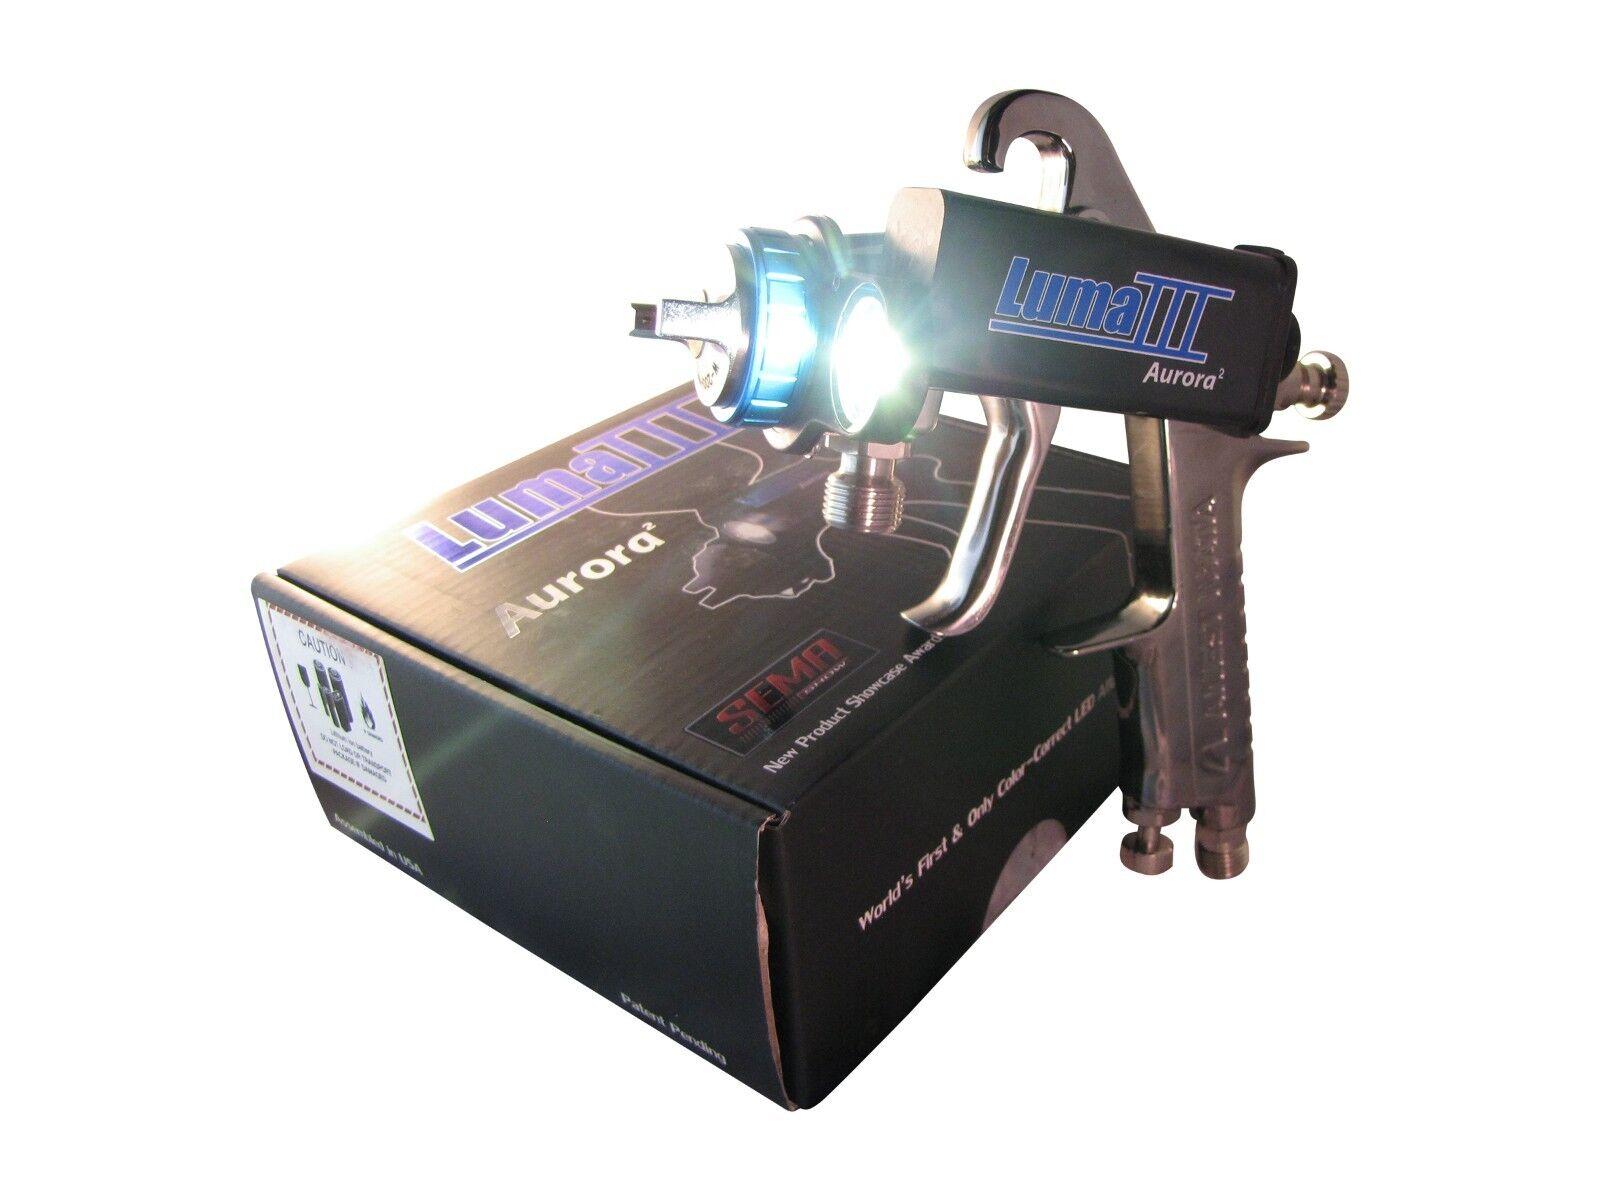 Luma Iii Aurora 2 Paint Gun Light New For Sale In Ivins